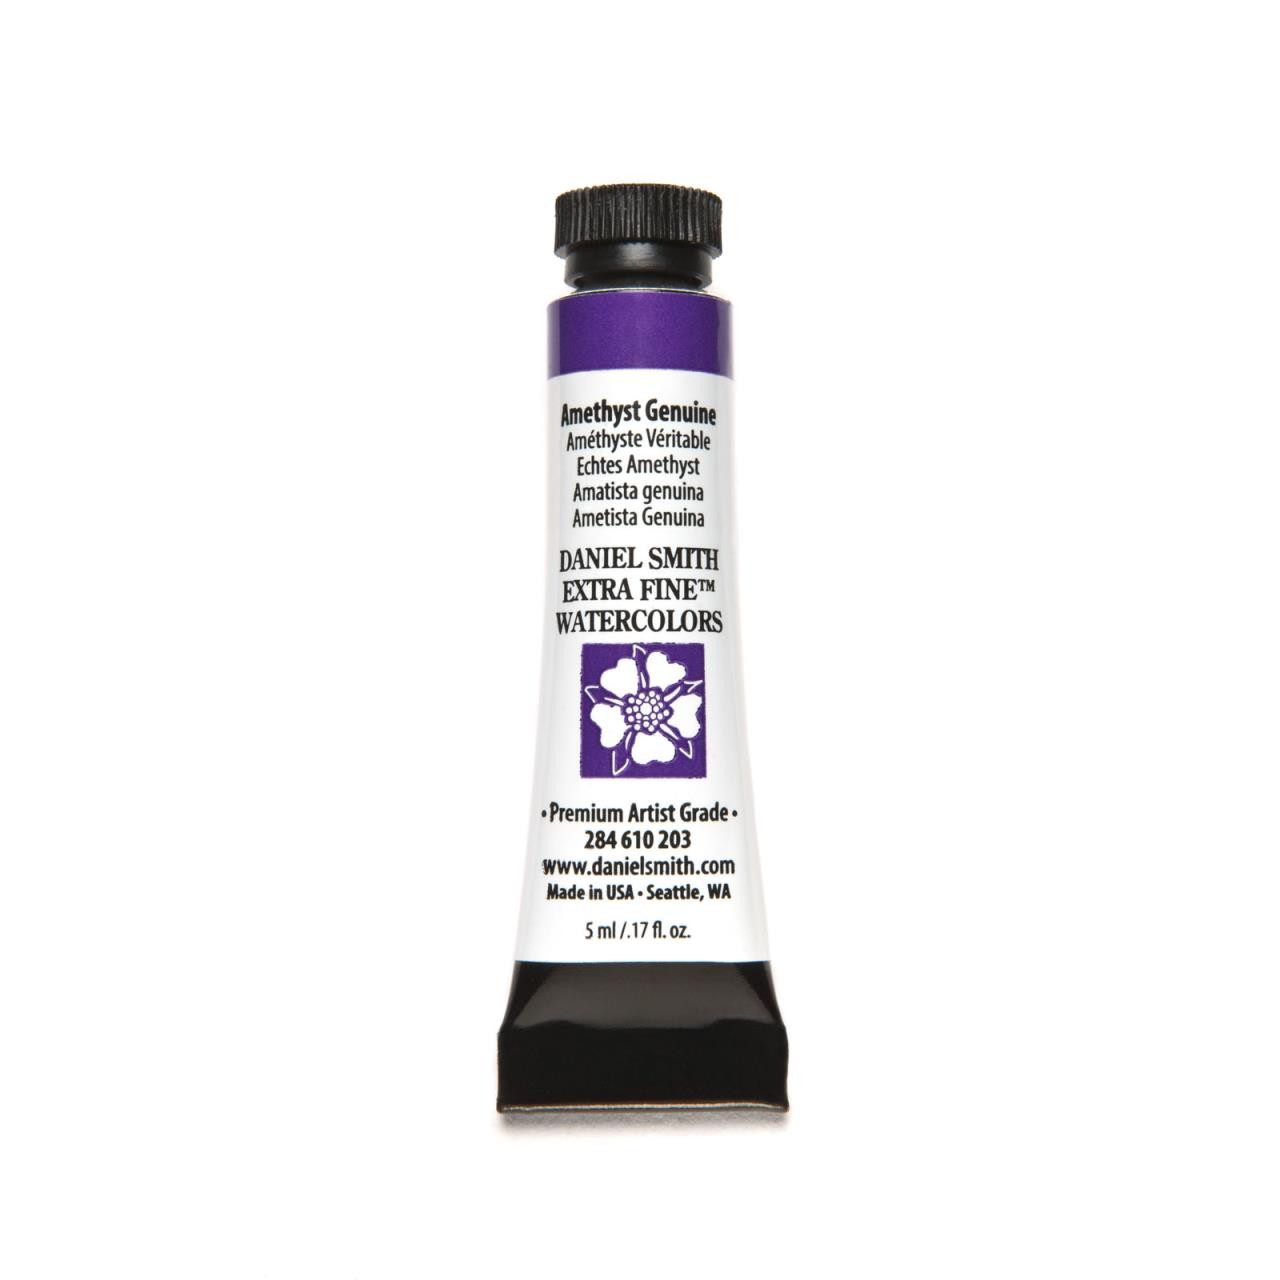 Amethyst Genuine (PrimaTek), DANIEL SMITH Extra Fine Watercolors 5ml Tubes -